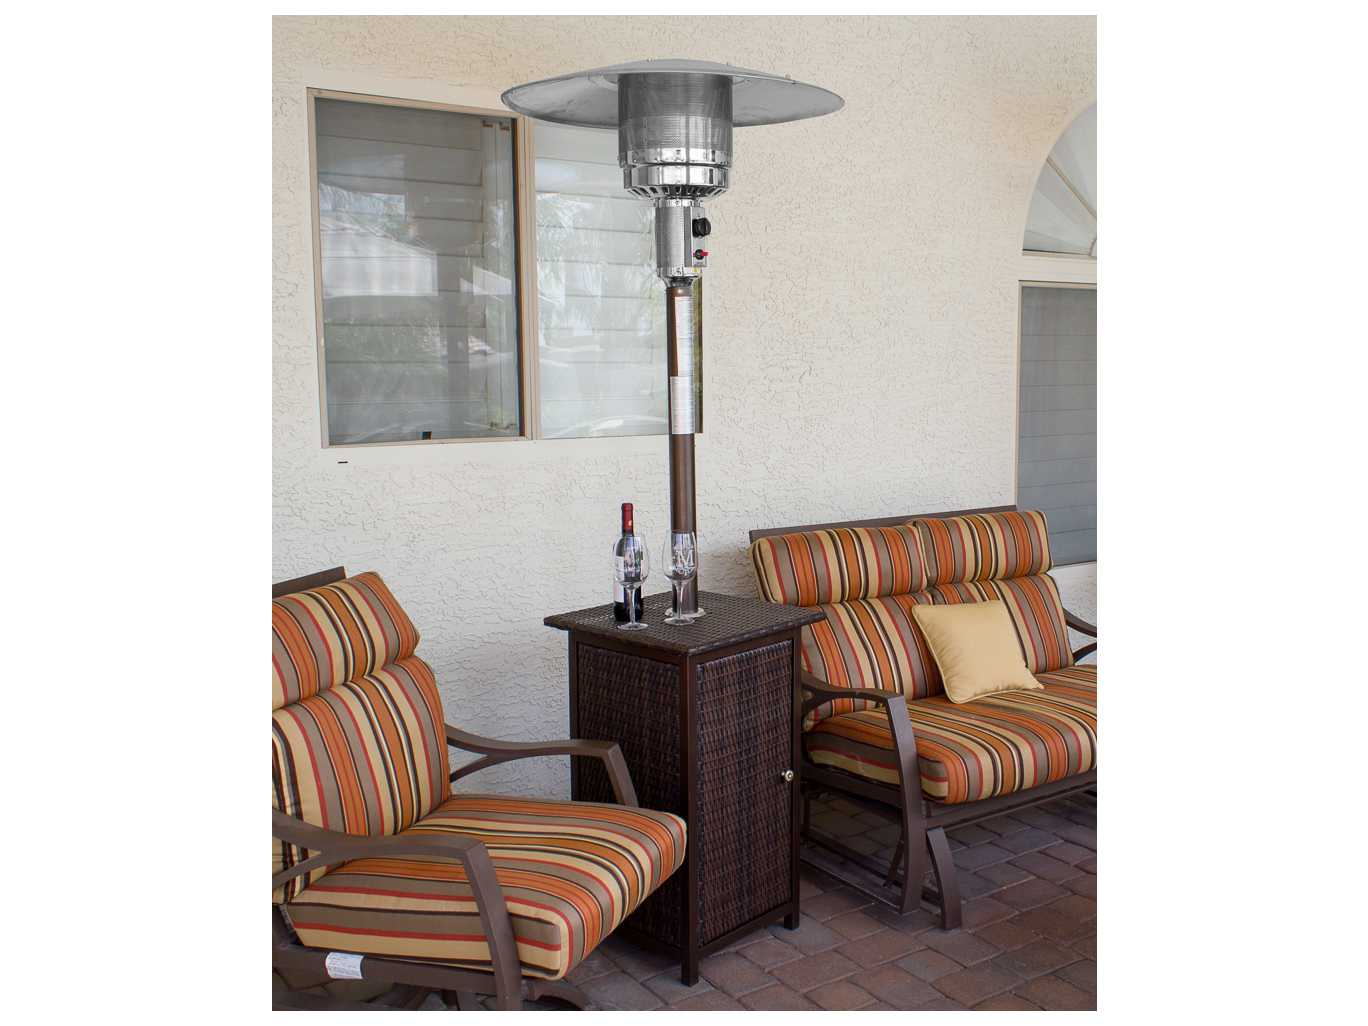 AZ Patio Heaters Tall Square Wicker Heater With Wheels